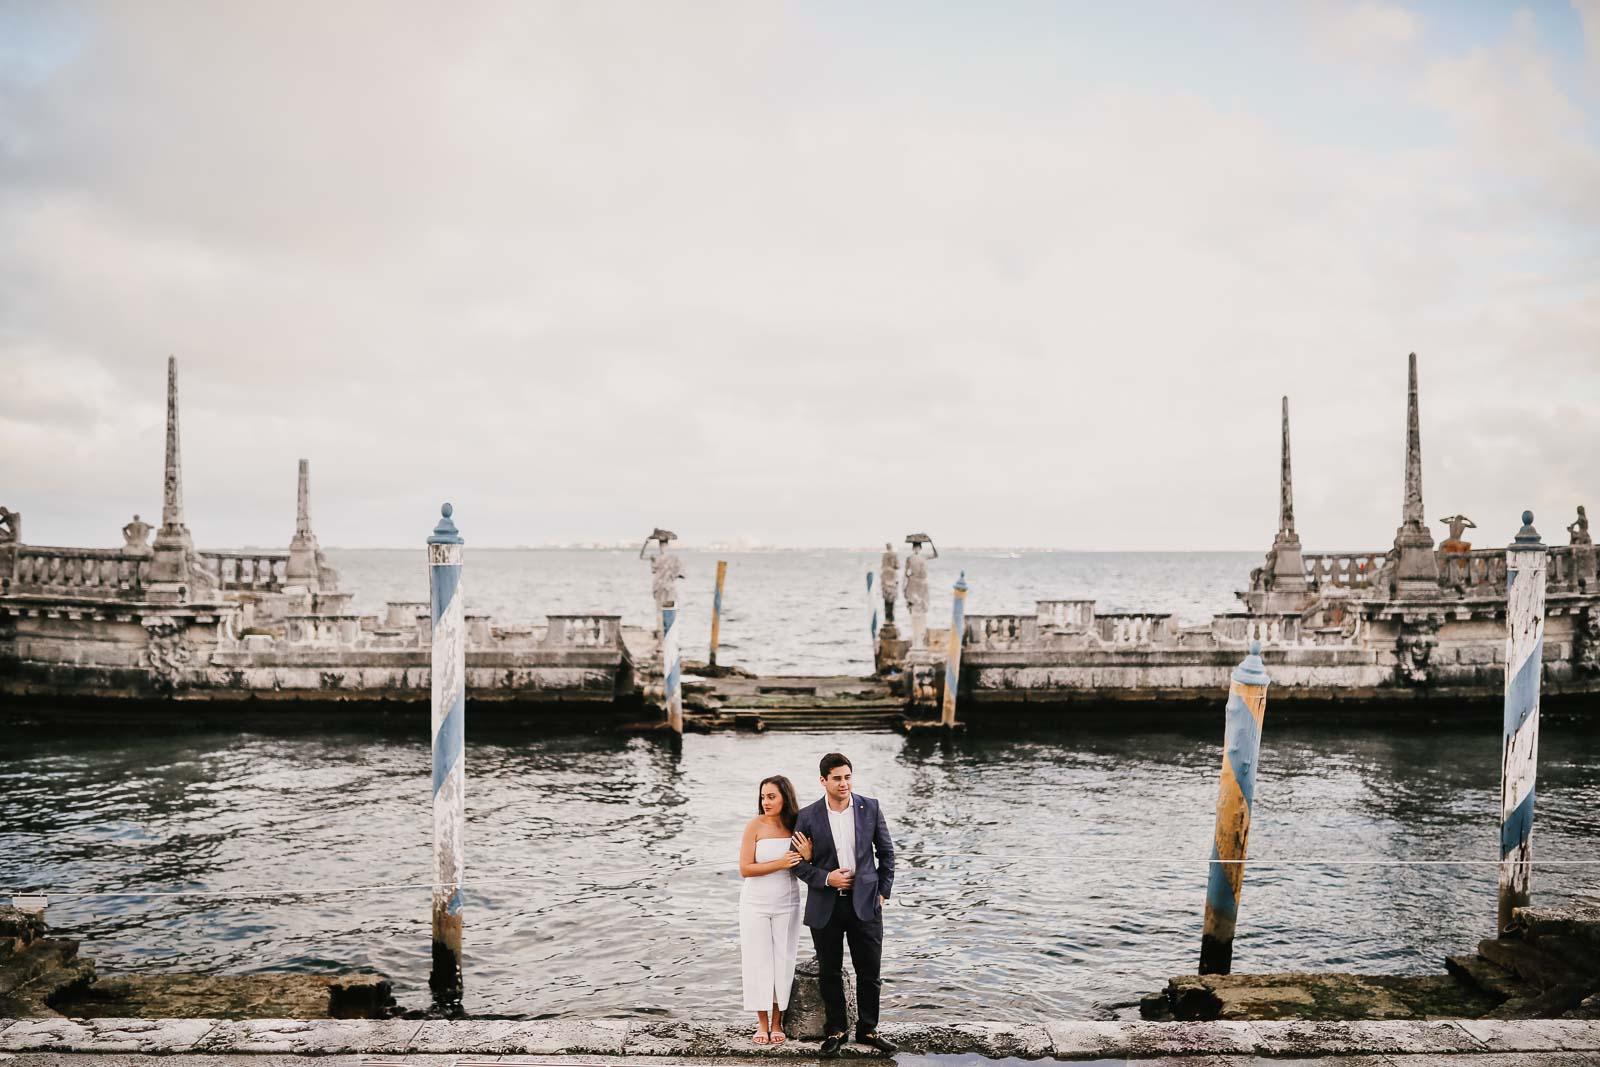 Wedding photographer Miami NYC Palm Beach